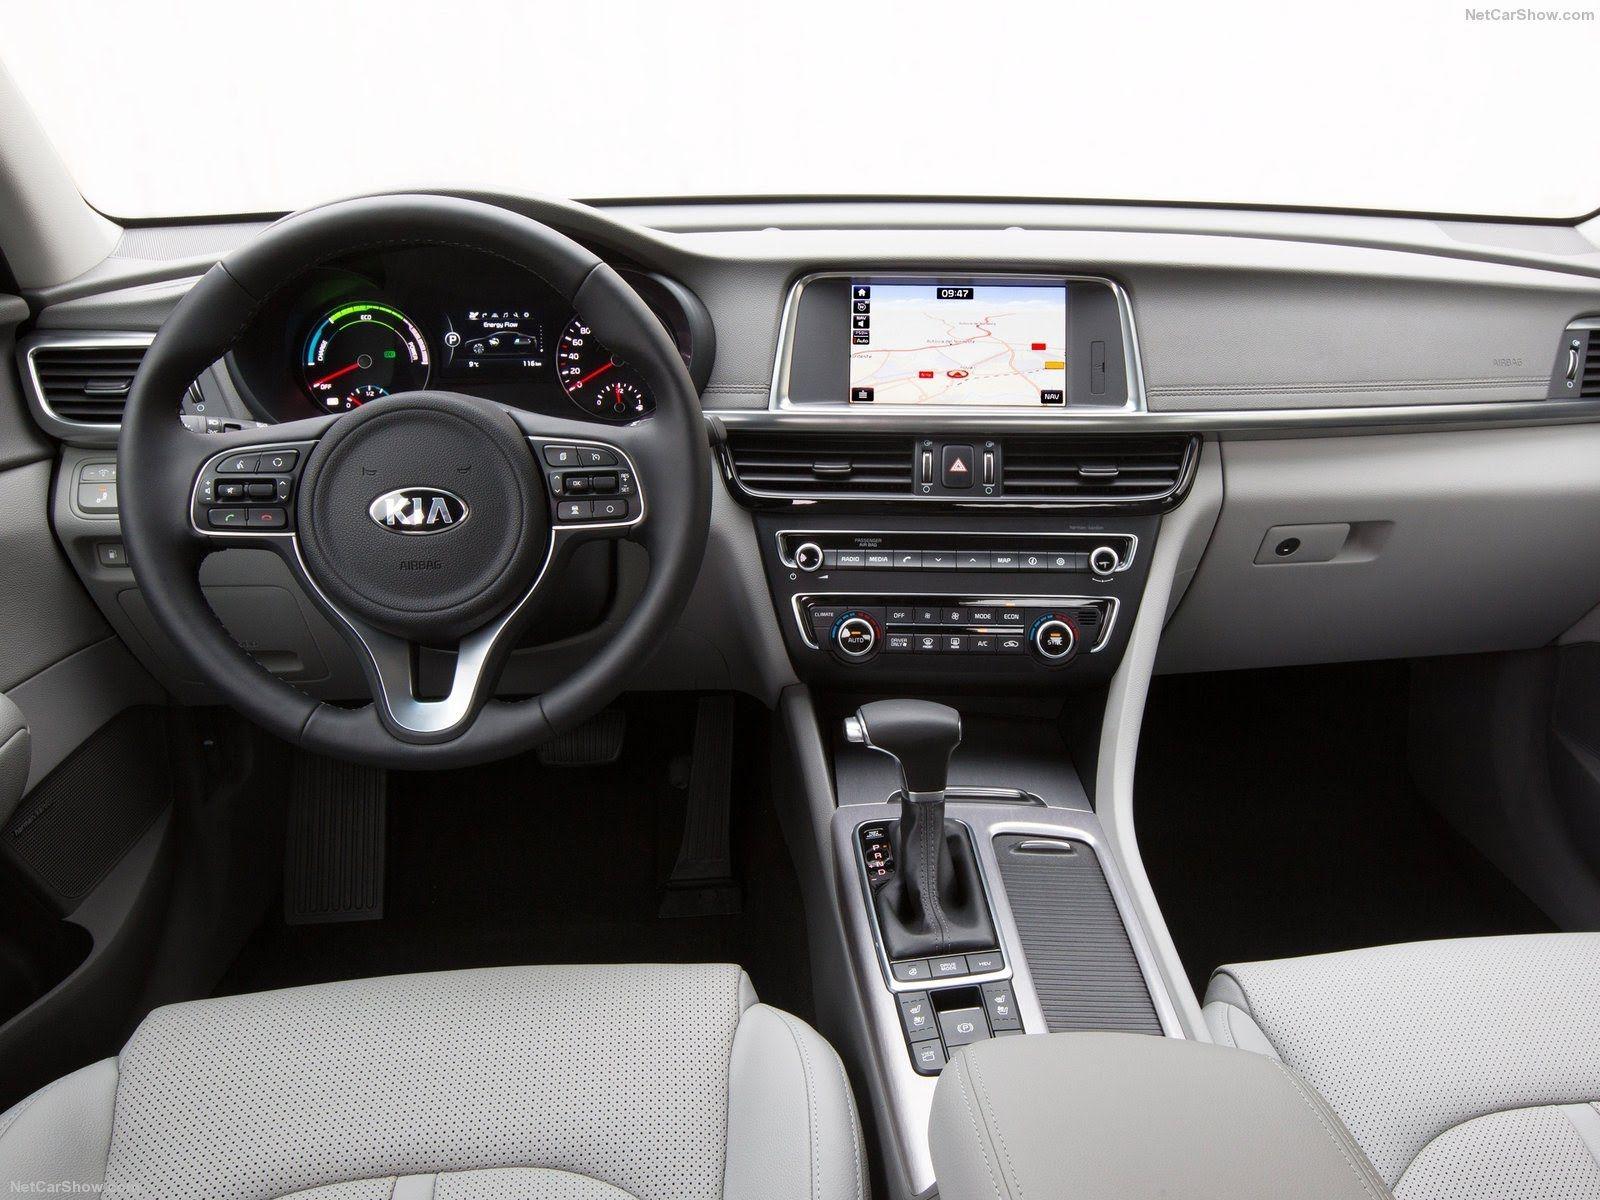 2017 Kia Optima Plug In Hybrid Eu Version Pure Electric Range Kia Optima Kia Kia Optima Interior